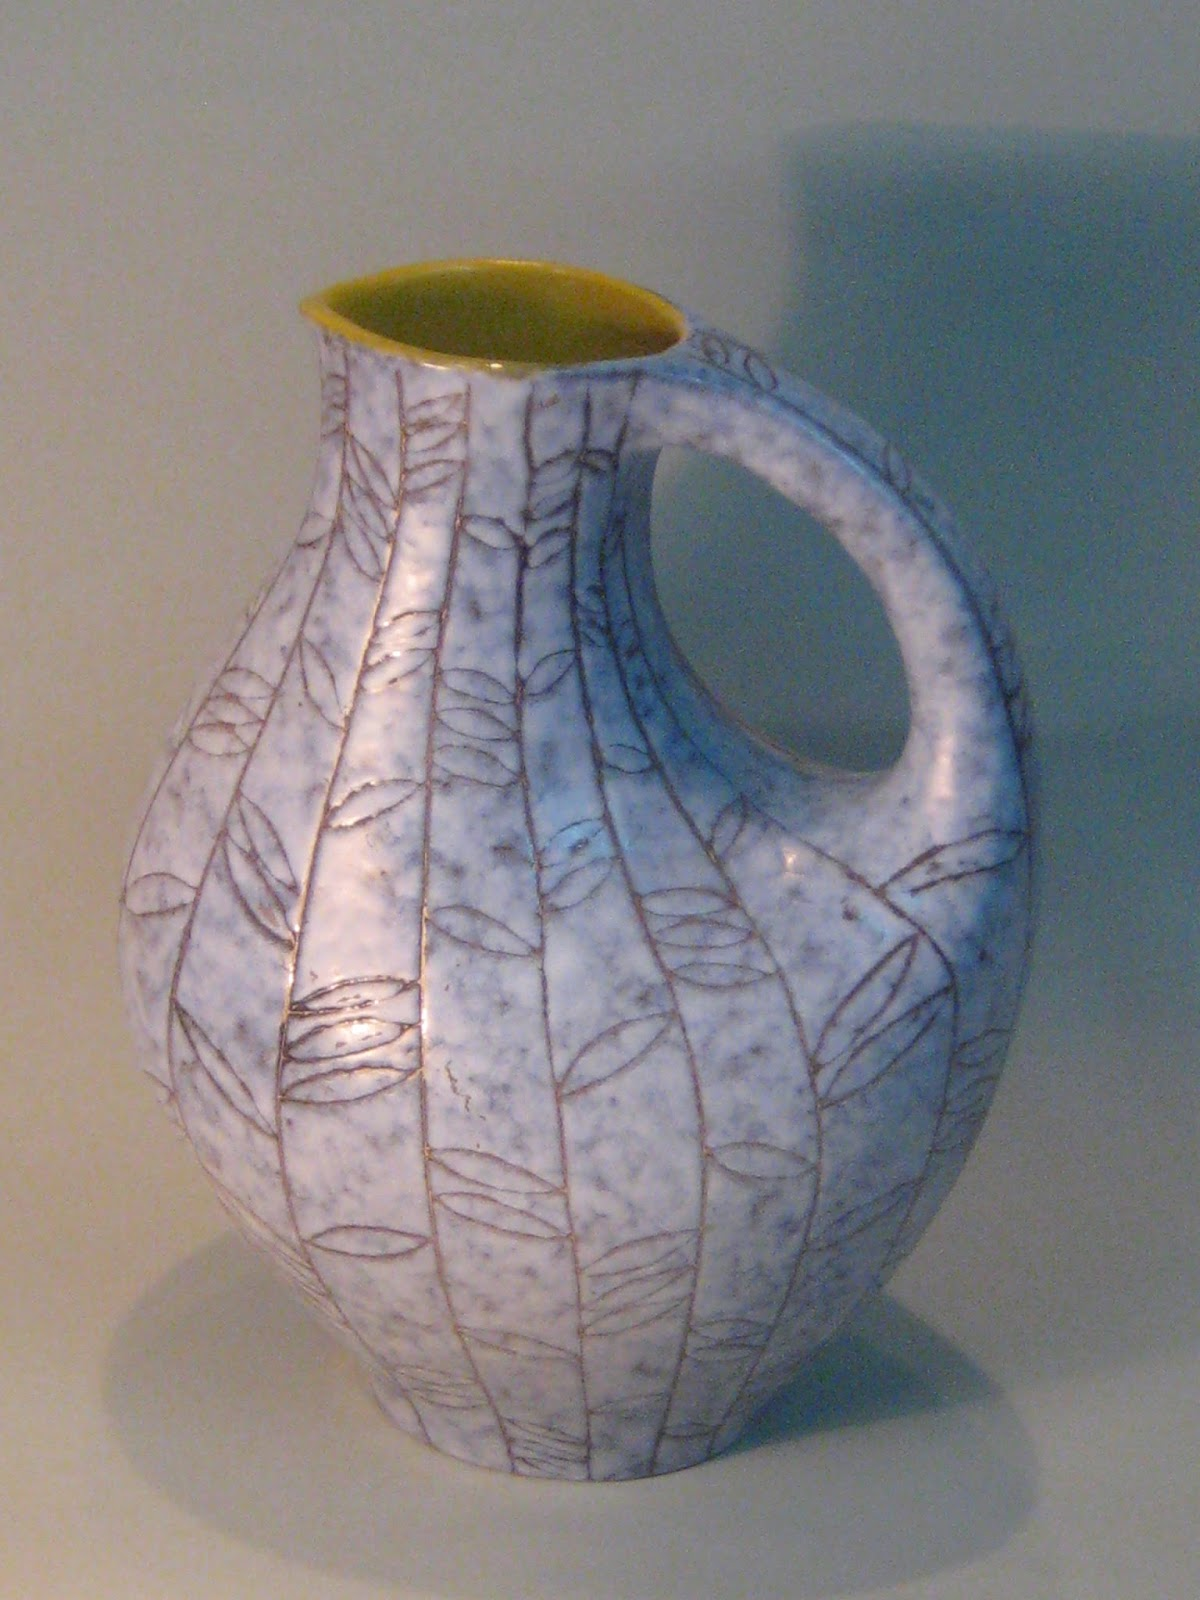 Odalisca madrid art nouveau art deco dise o del siglo - Ceramica decoracion ...